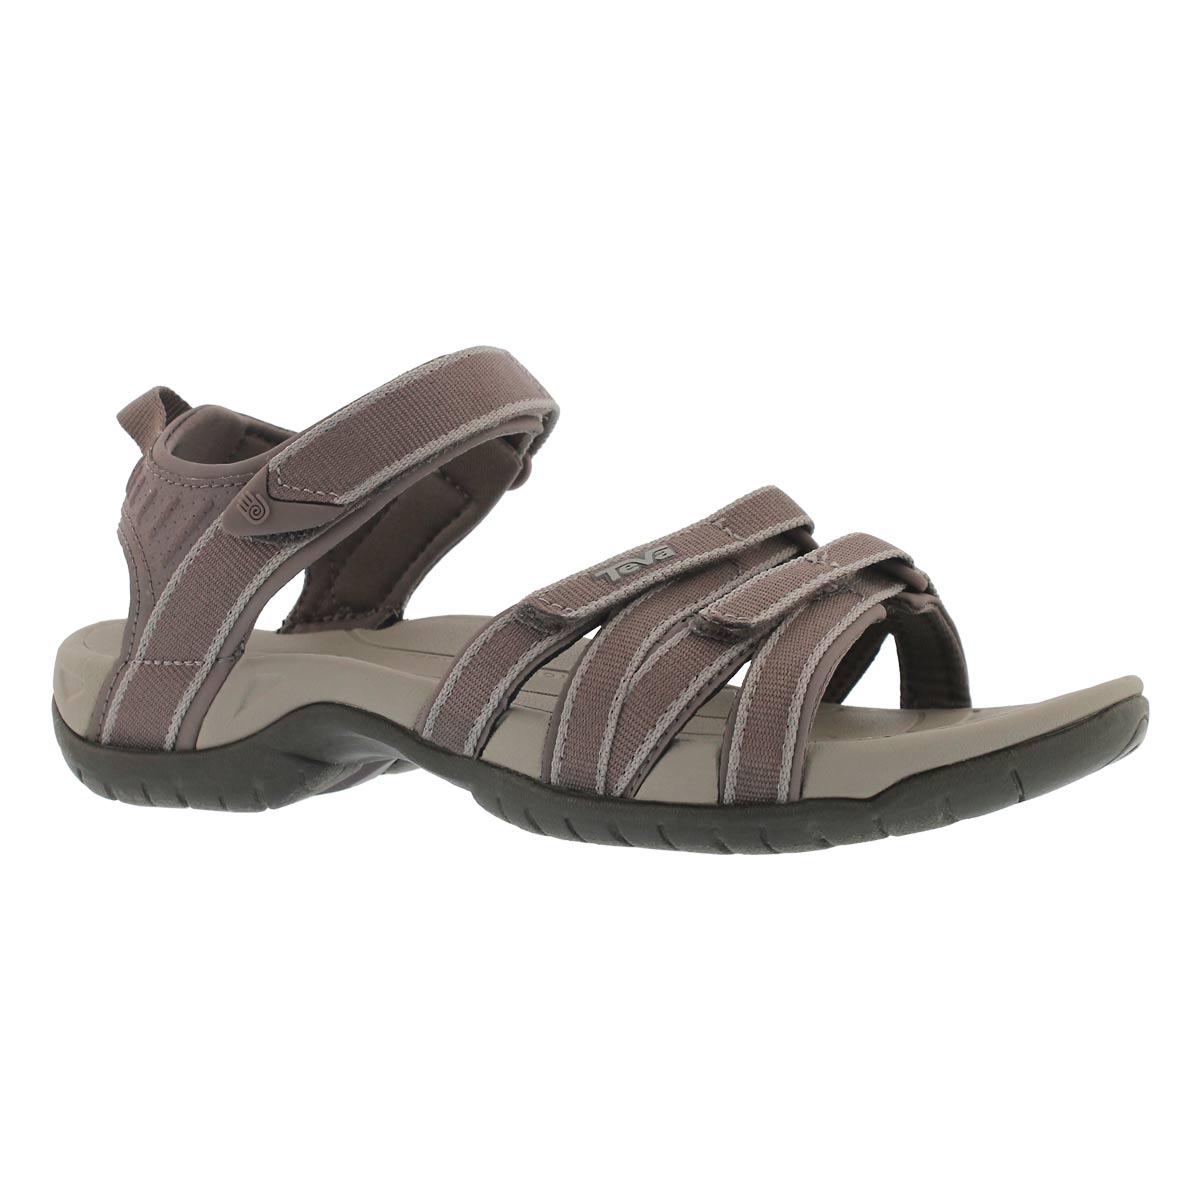 Sandale sport Tirra, prune, fem